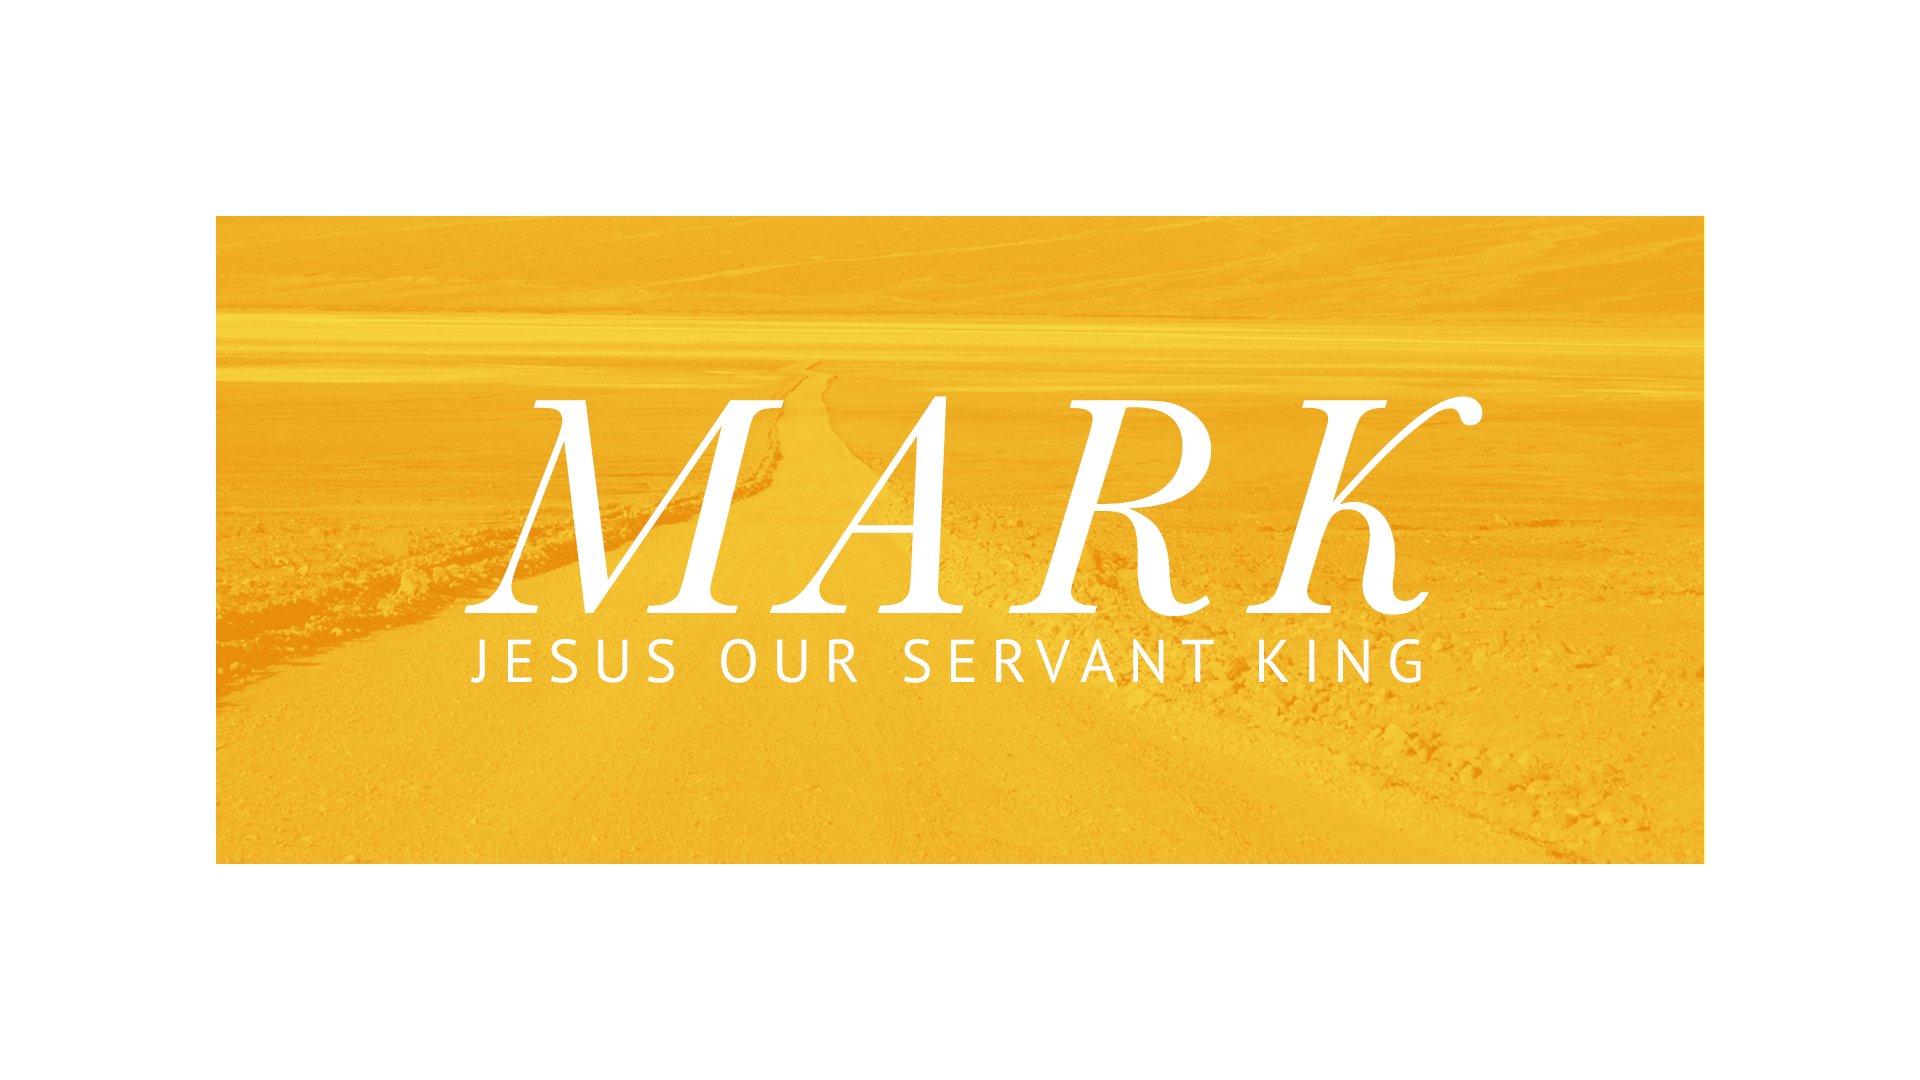 May 5, 2019 – The Gospel of Mark